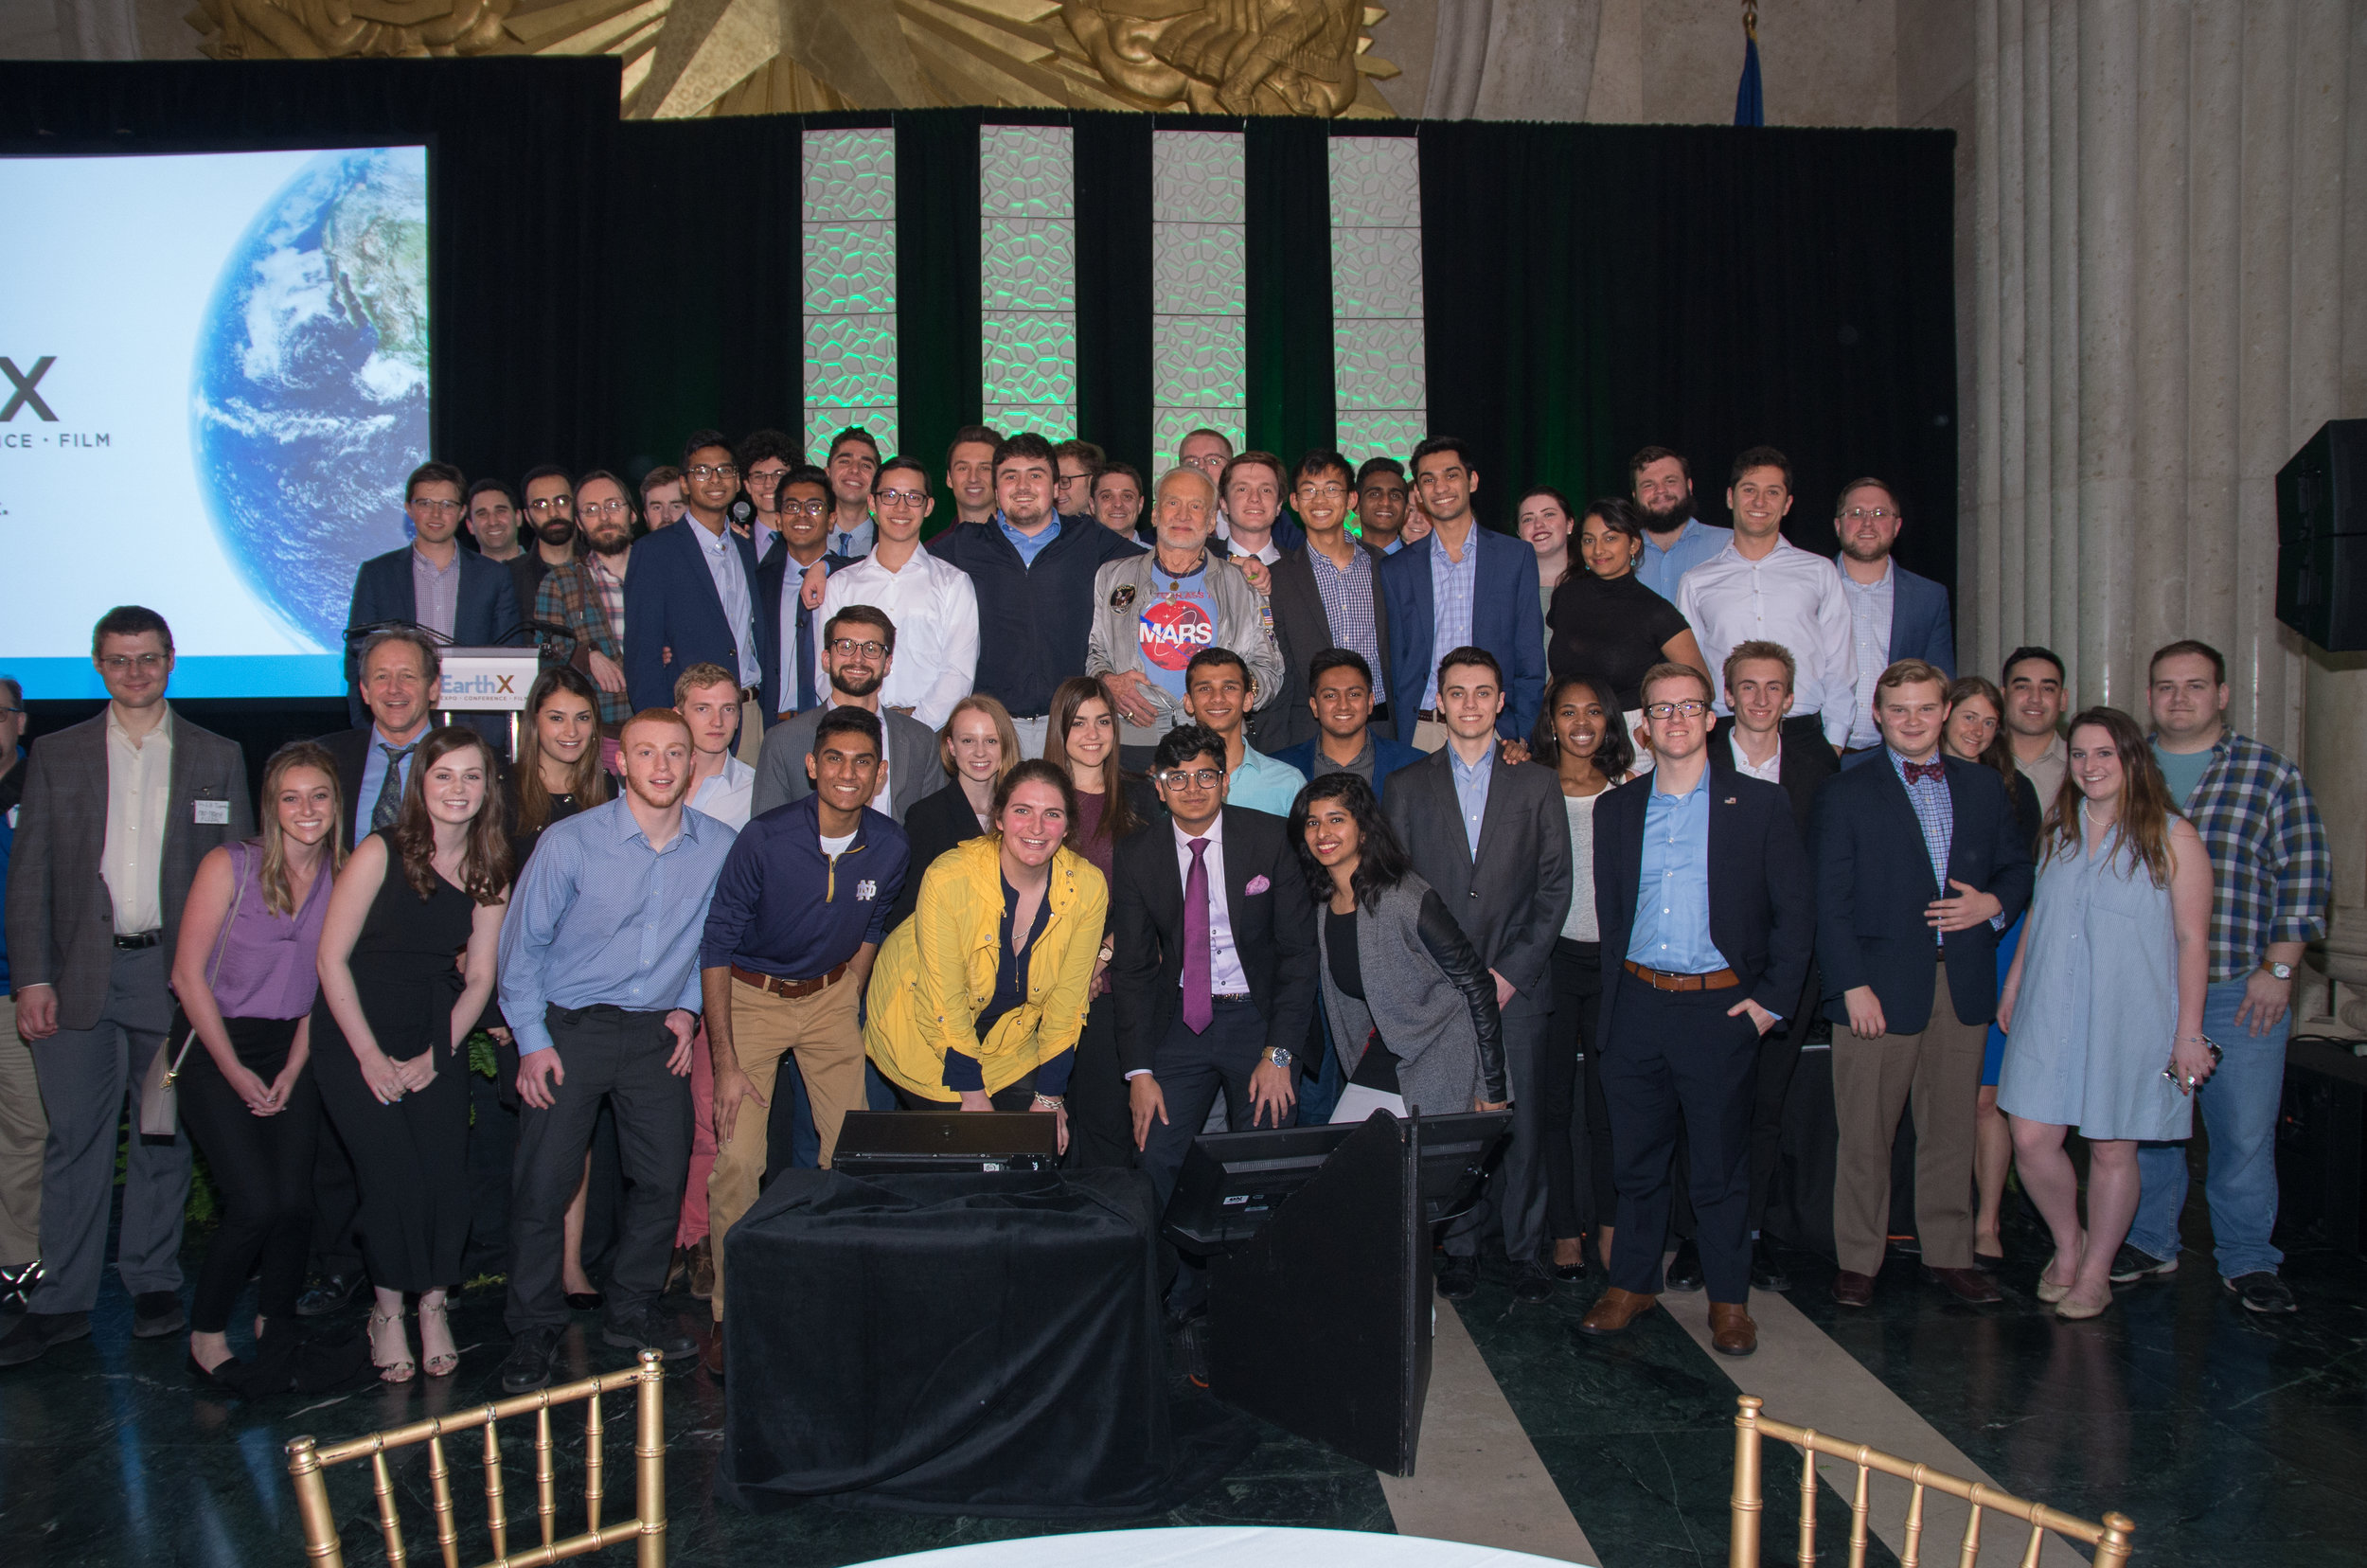 2018-04-21 - EarthX Bridge Summit Conference (SD) 203.jpg